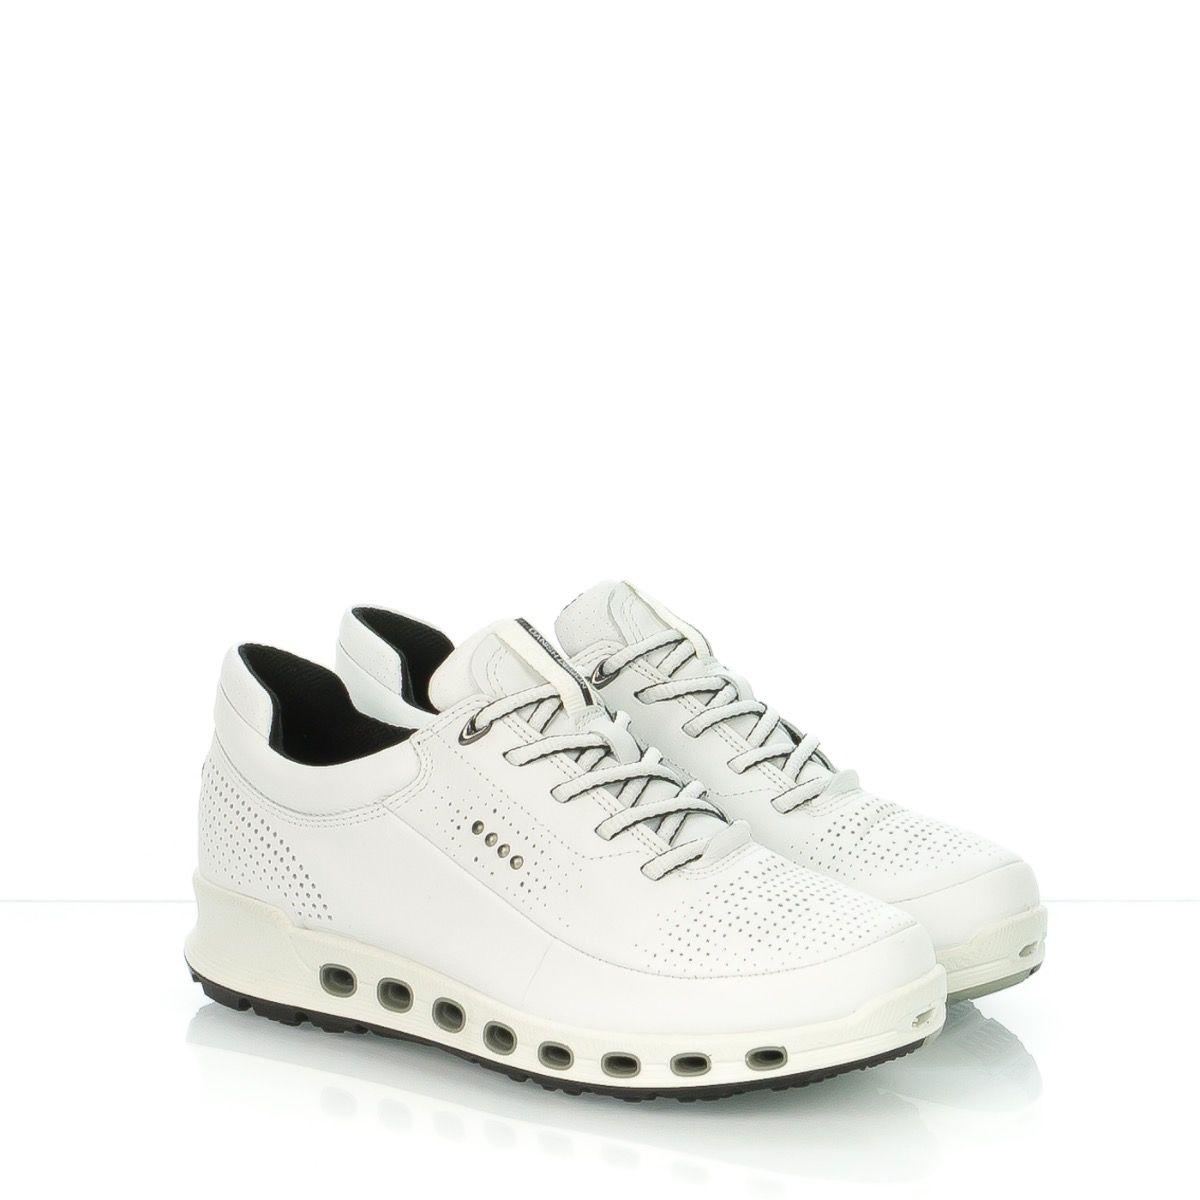 Ecco Donna Sneaker Cool 842513 Scarpa 0 Surrond Goretex Pelle 2 EH92WID